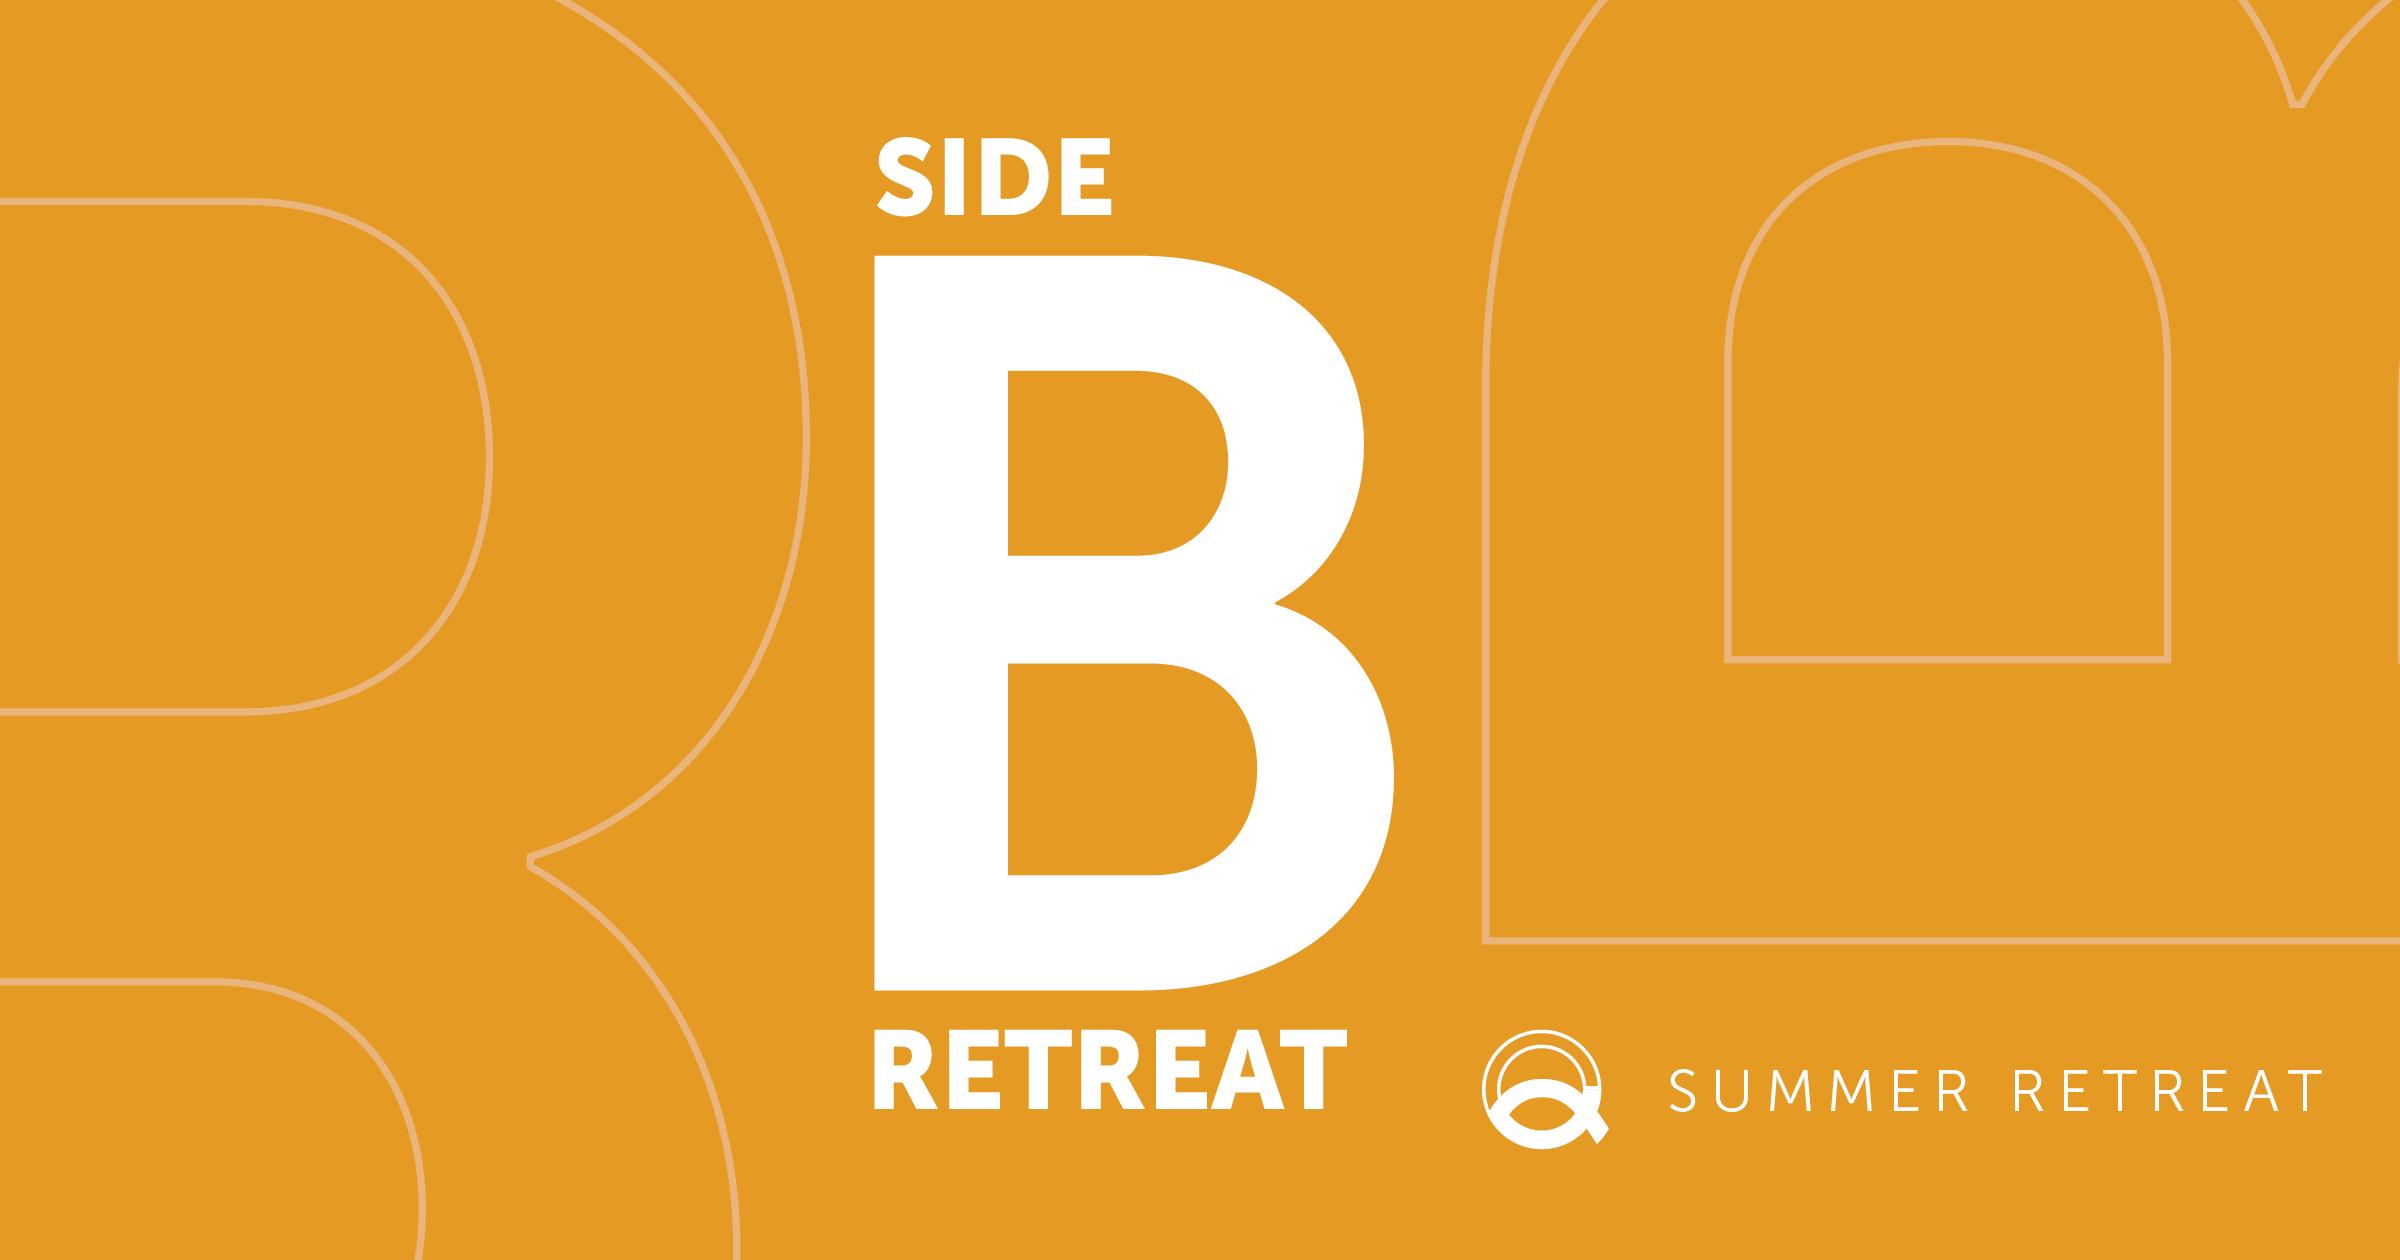 QCF_Summer19_SideB_FB.png